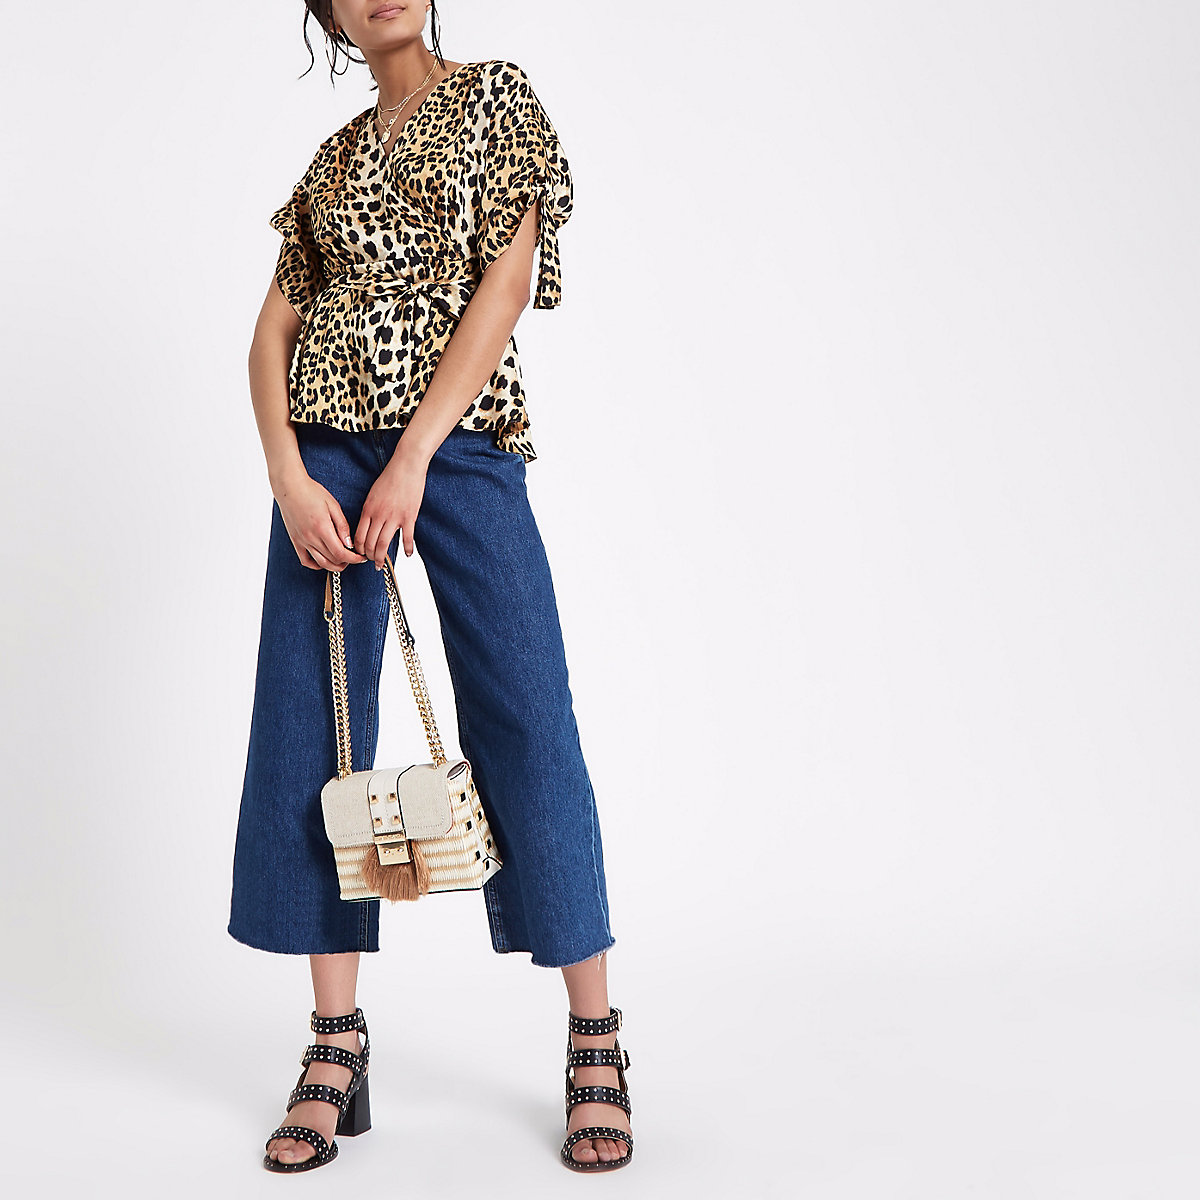 89bde877a79 Brown leopard print tie side wrap top - Blouses - Tops - women